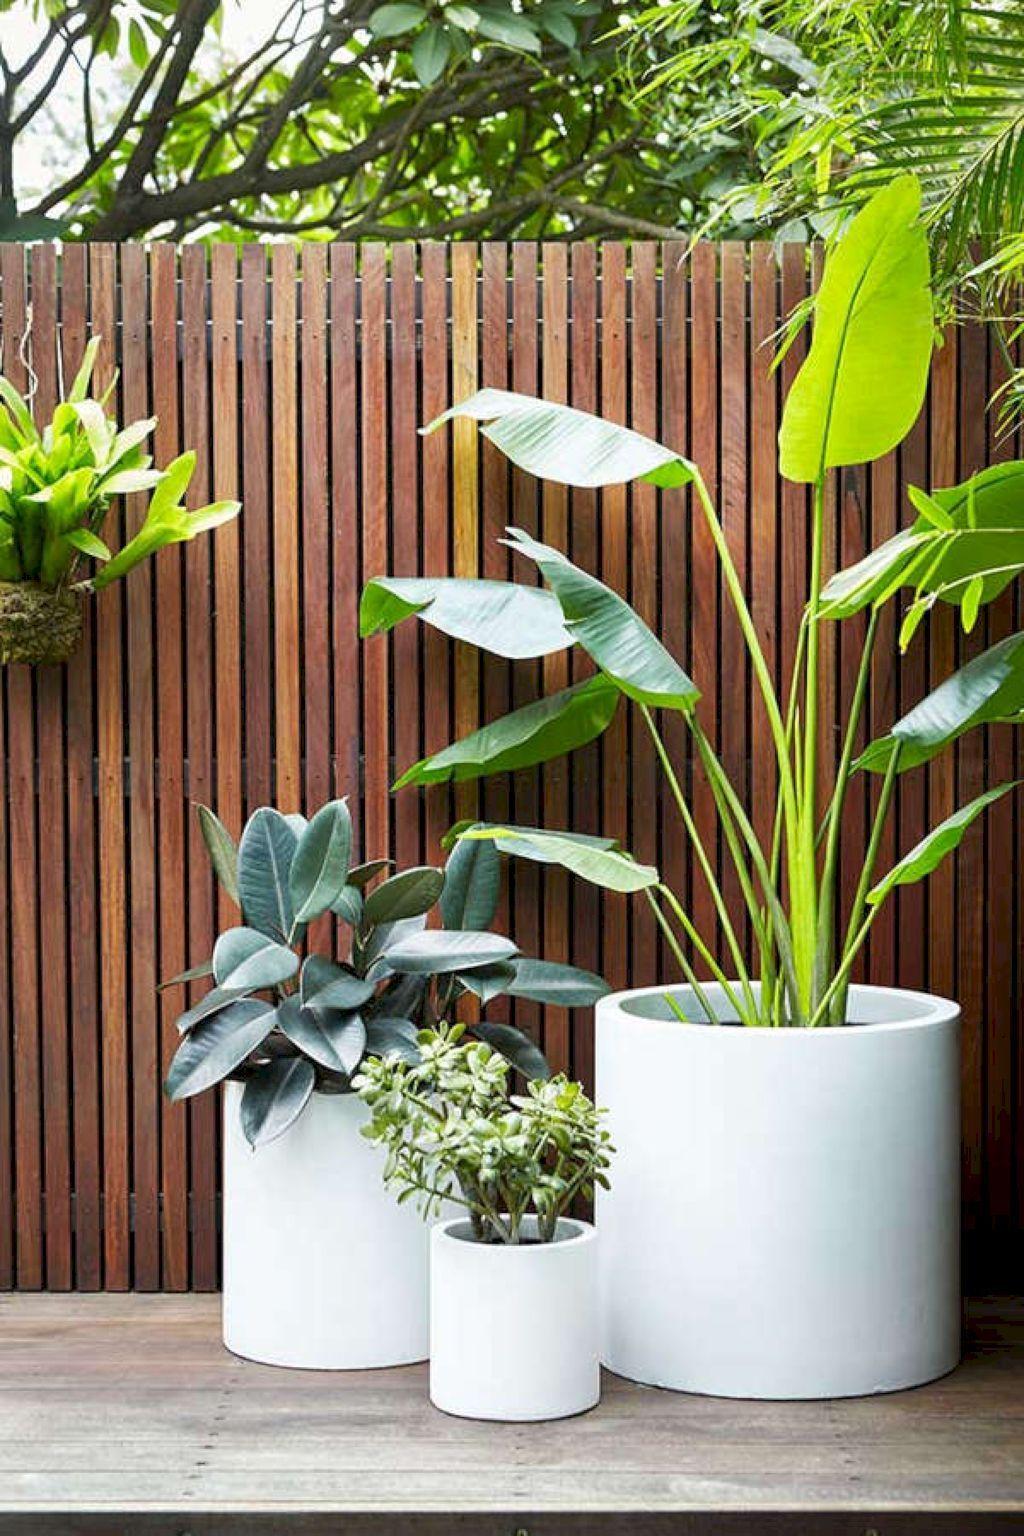 58 Awesome Small Backyard Patio Design Ideas Small 400 x 300